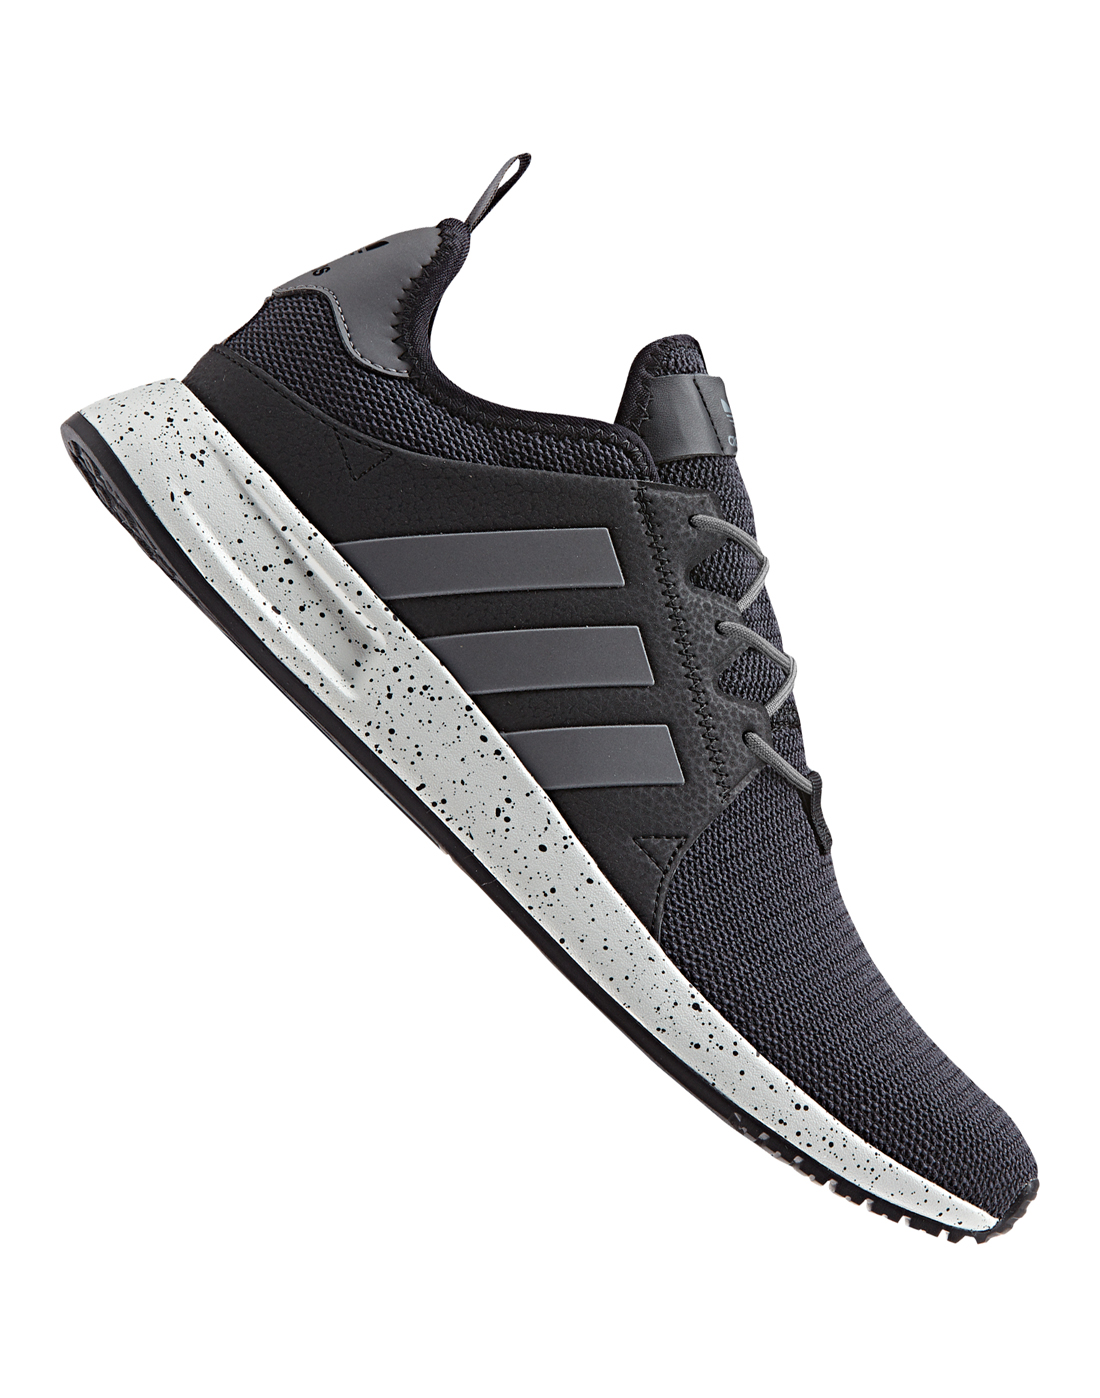 Adidas Originals X PLR Knit Trainer Dark Grey Black